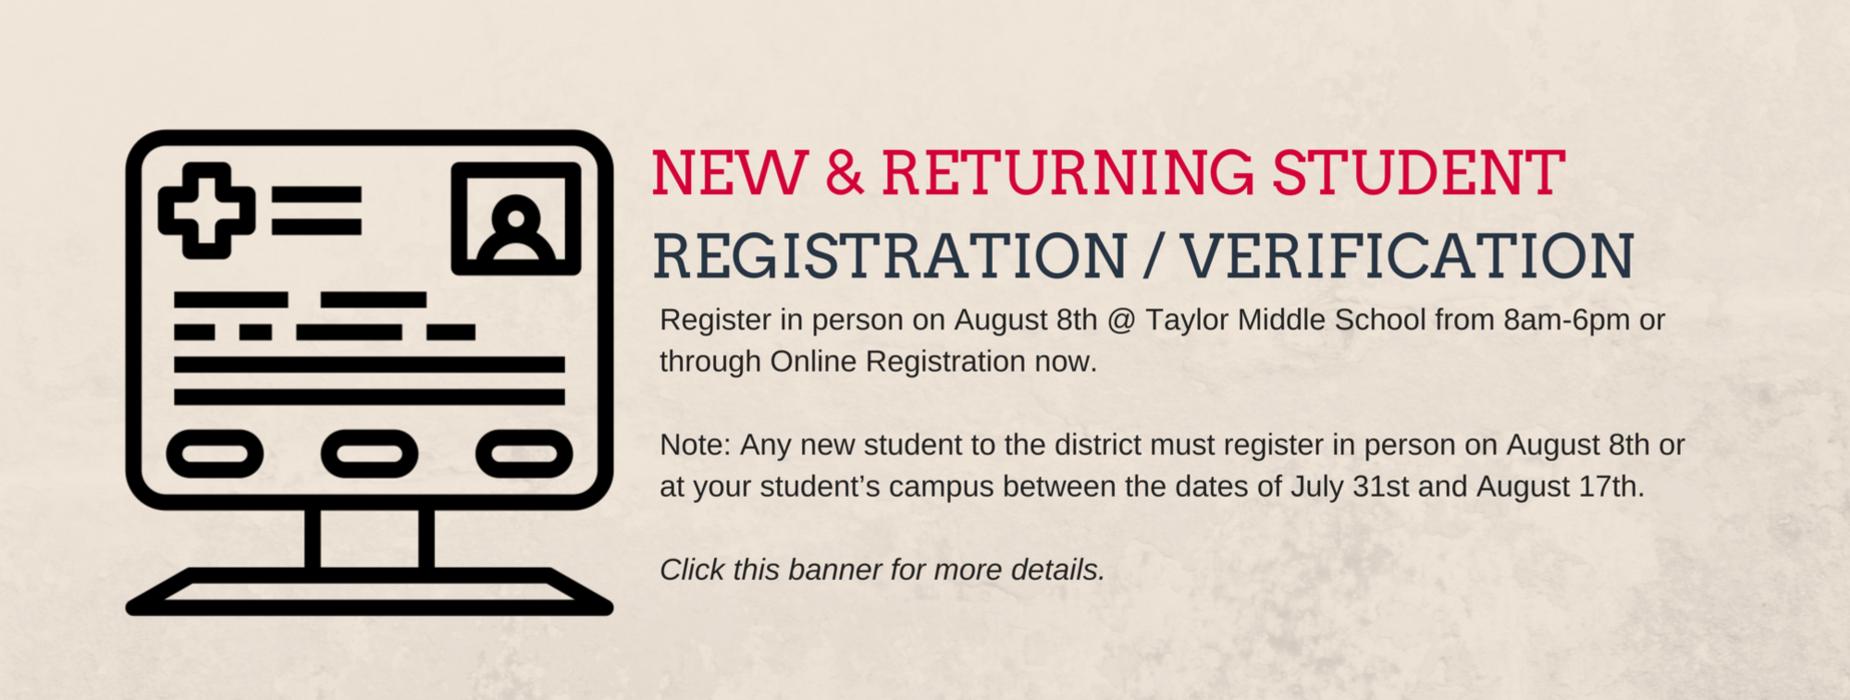 Registration/Verification Information